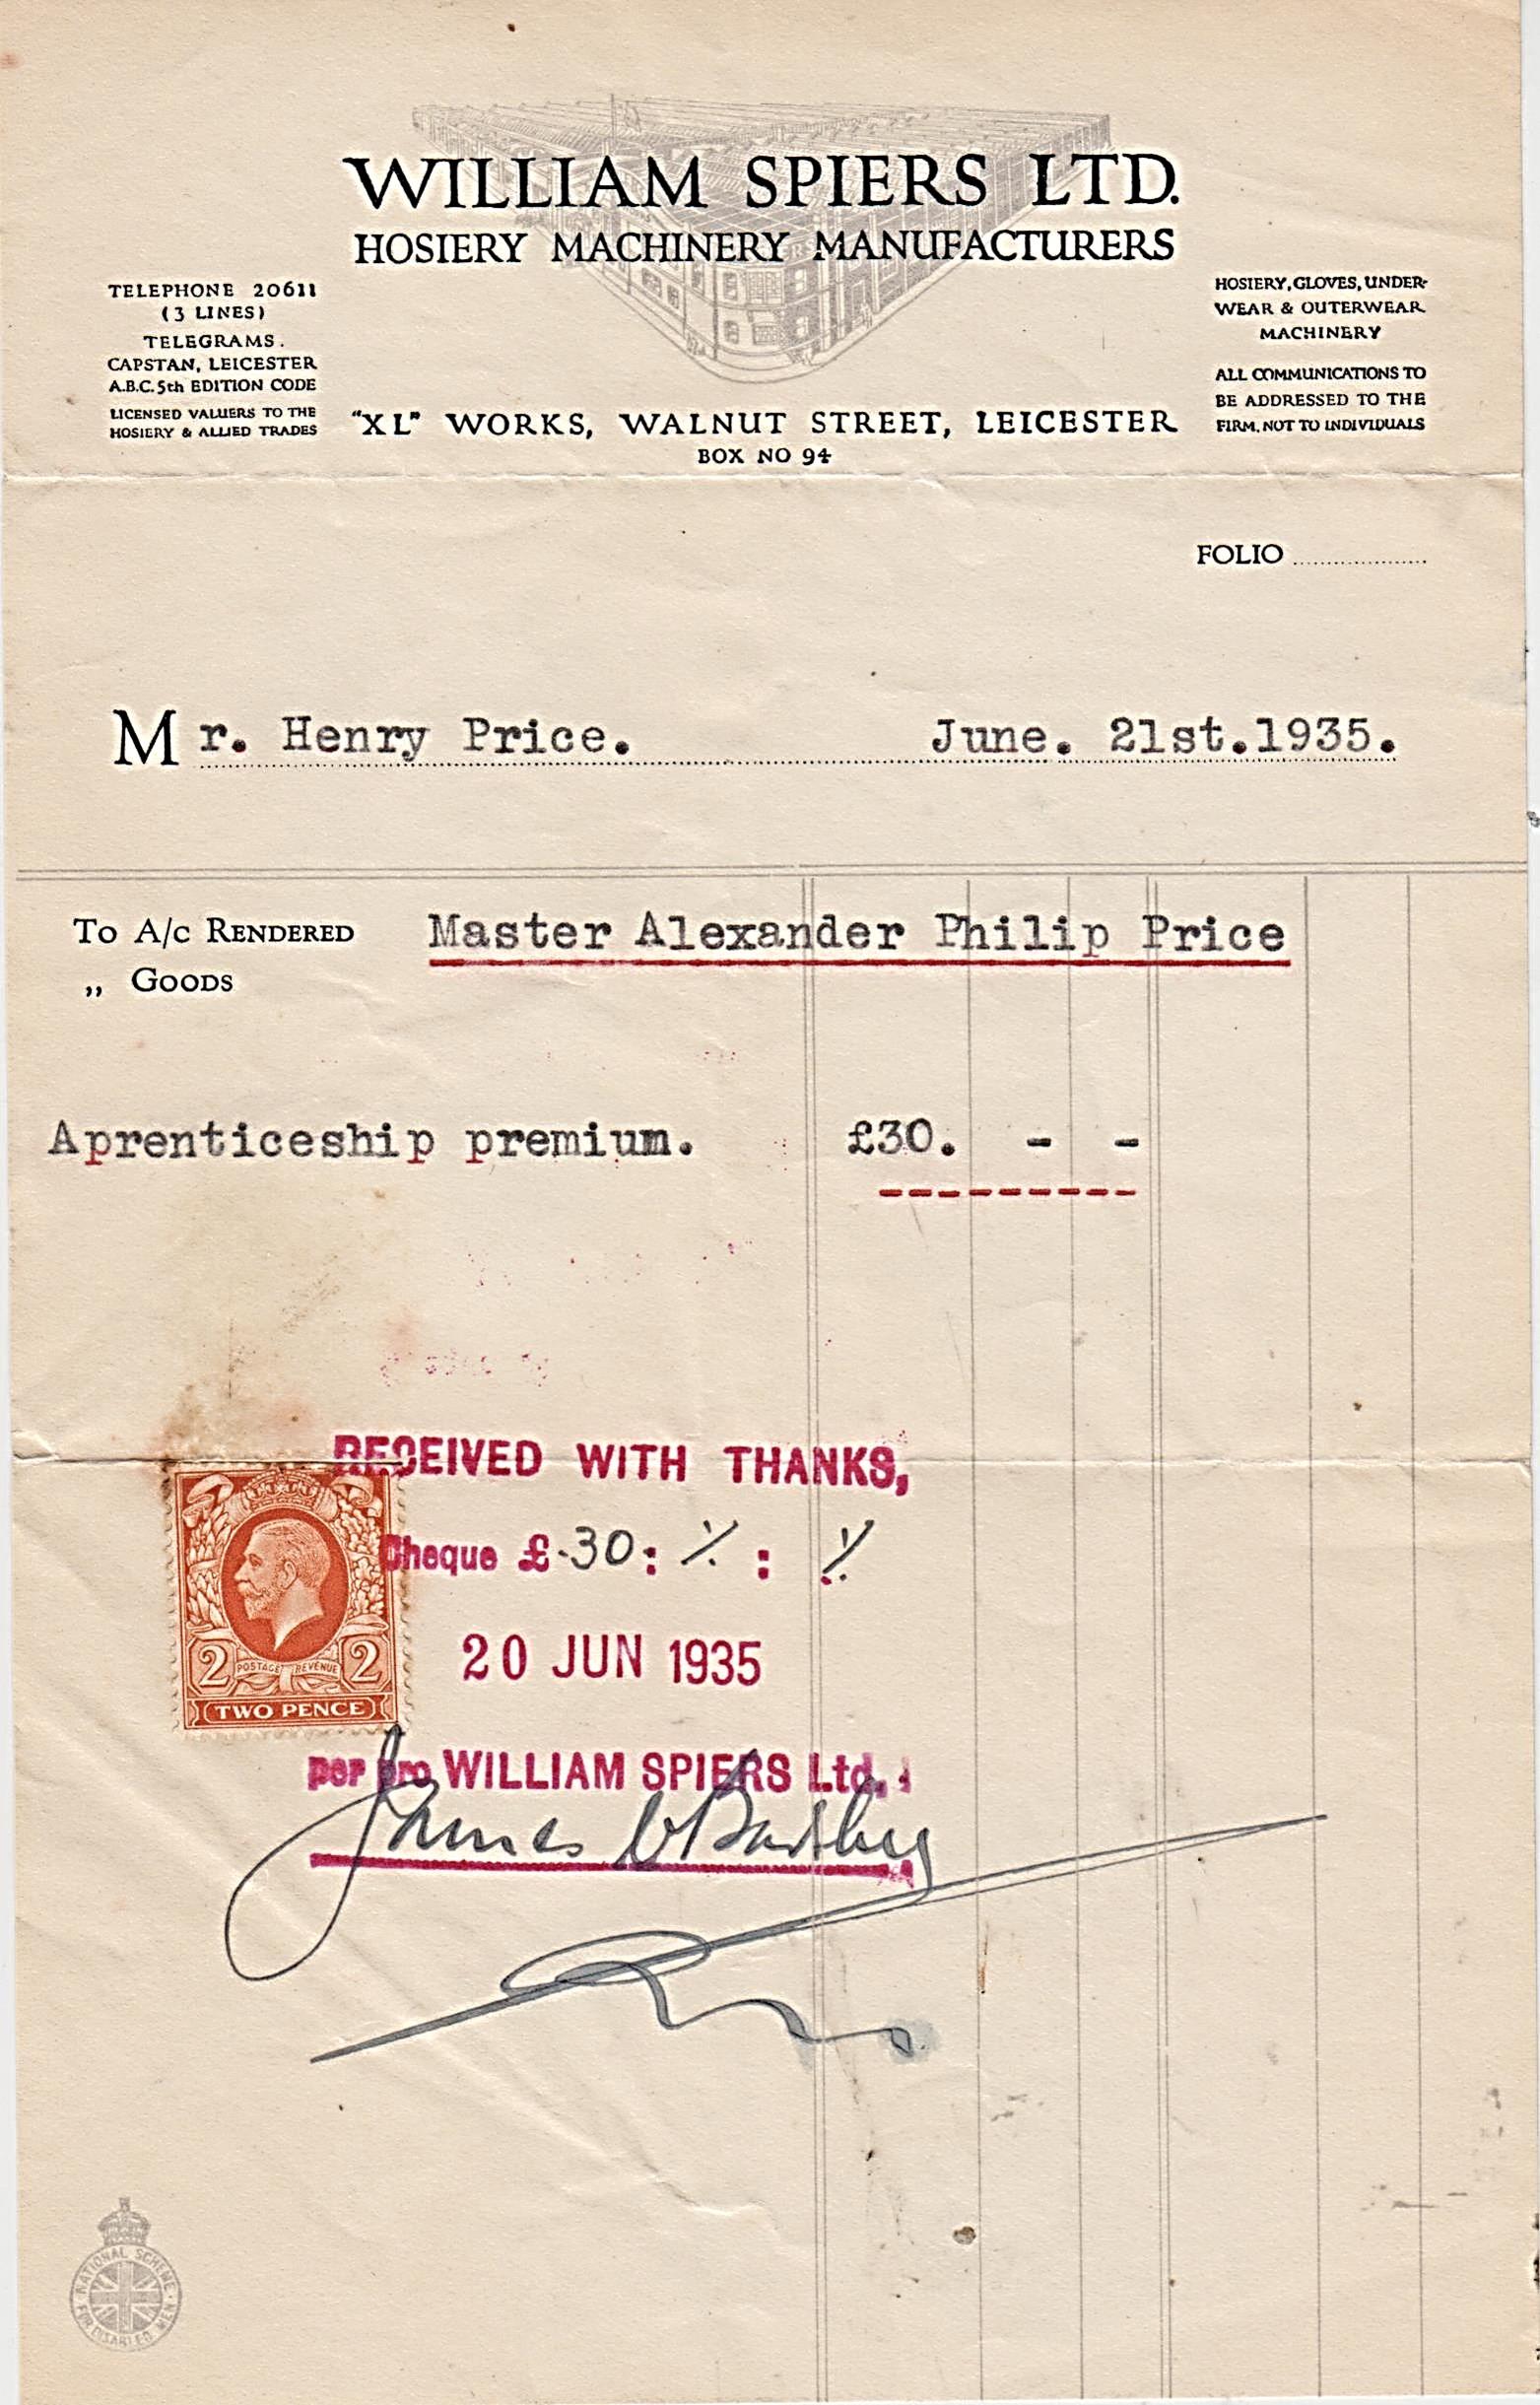 phil_apprenticeship_1935_001.jpg